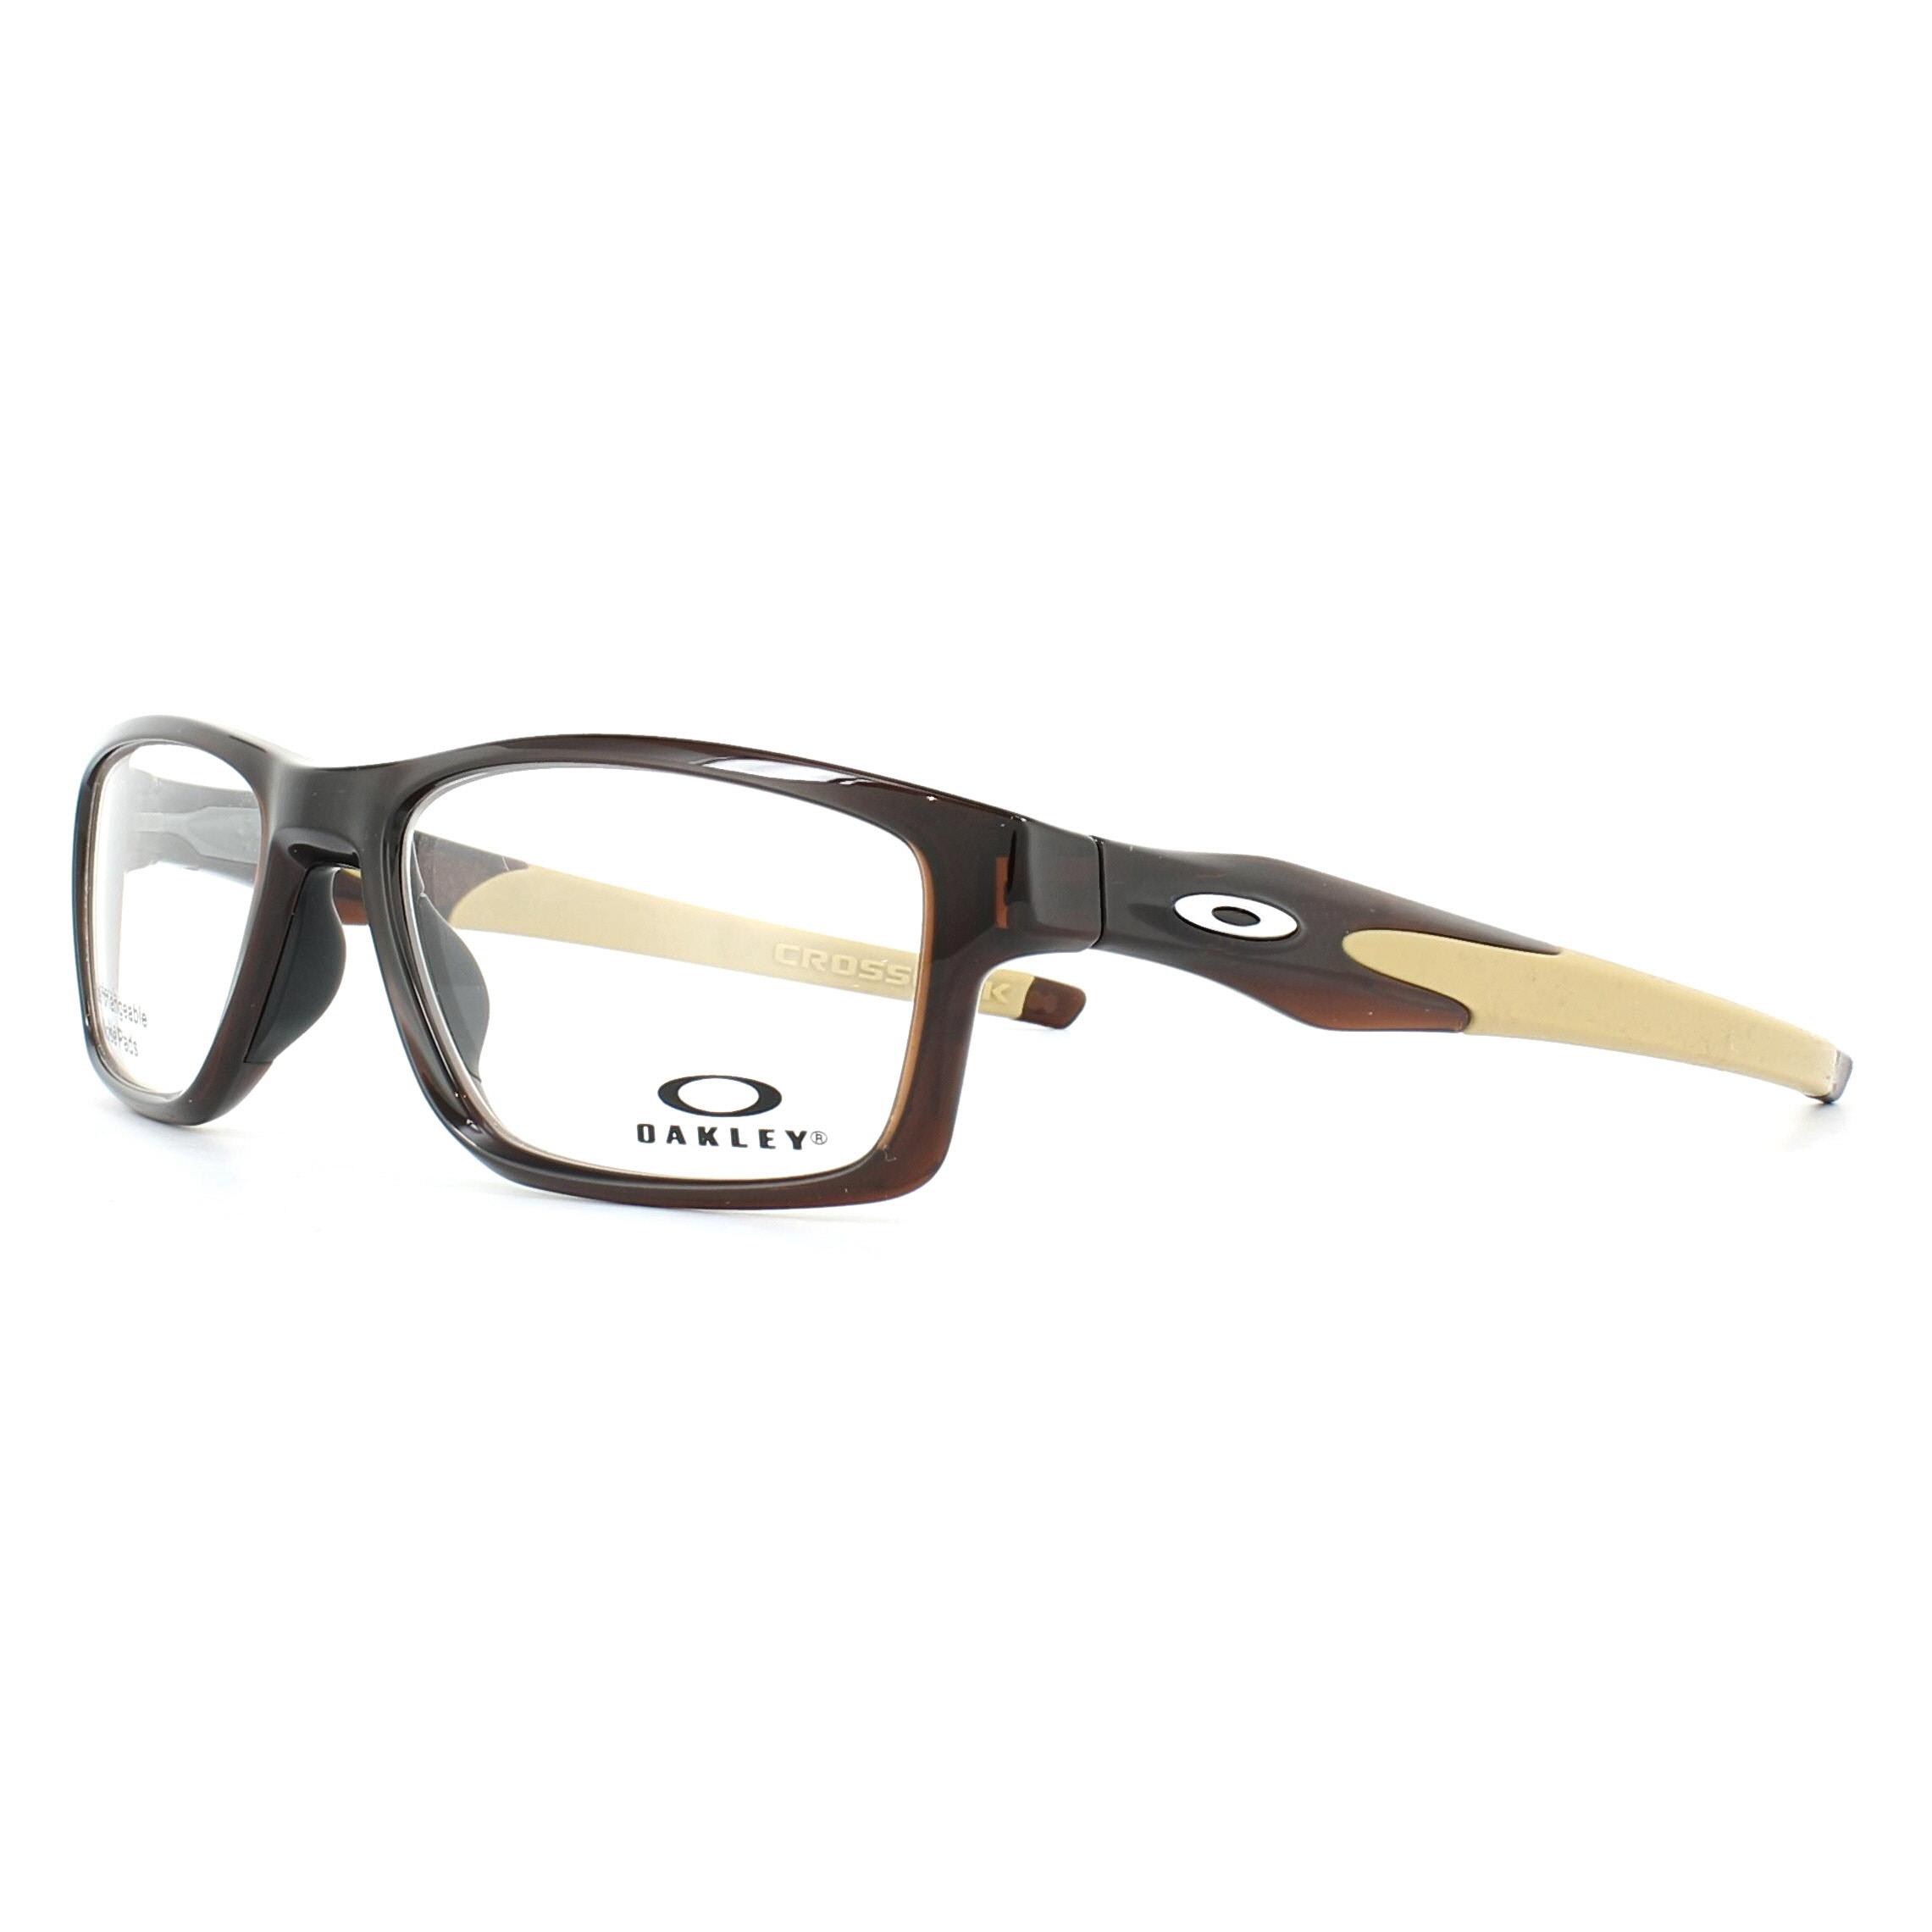 80792cbf312 Sentinel Oakley Glasses Frames Crosslink Trubridge OX8090-04 Polished  Rootbeer 55mm Mens